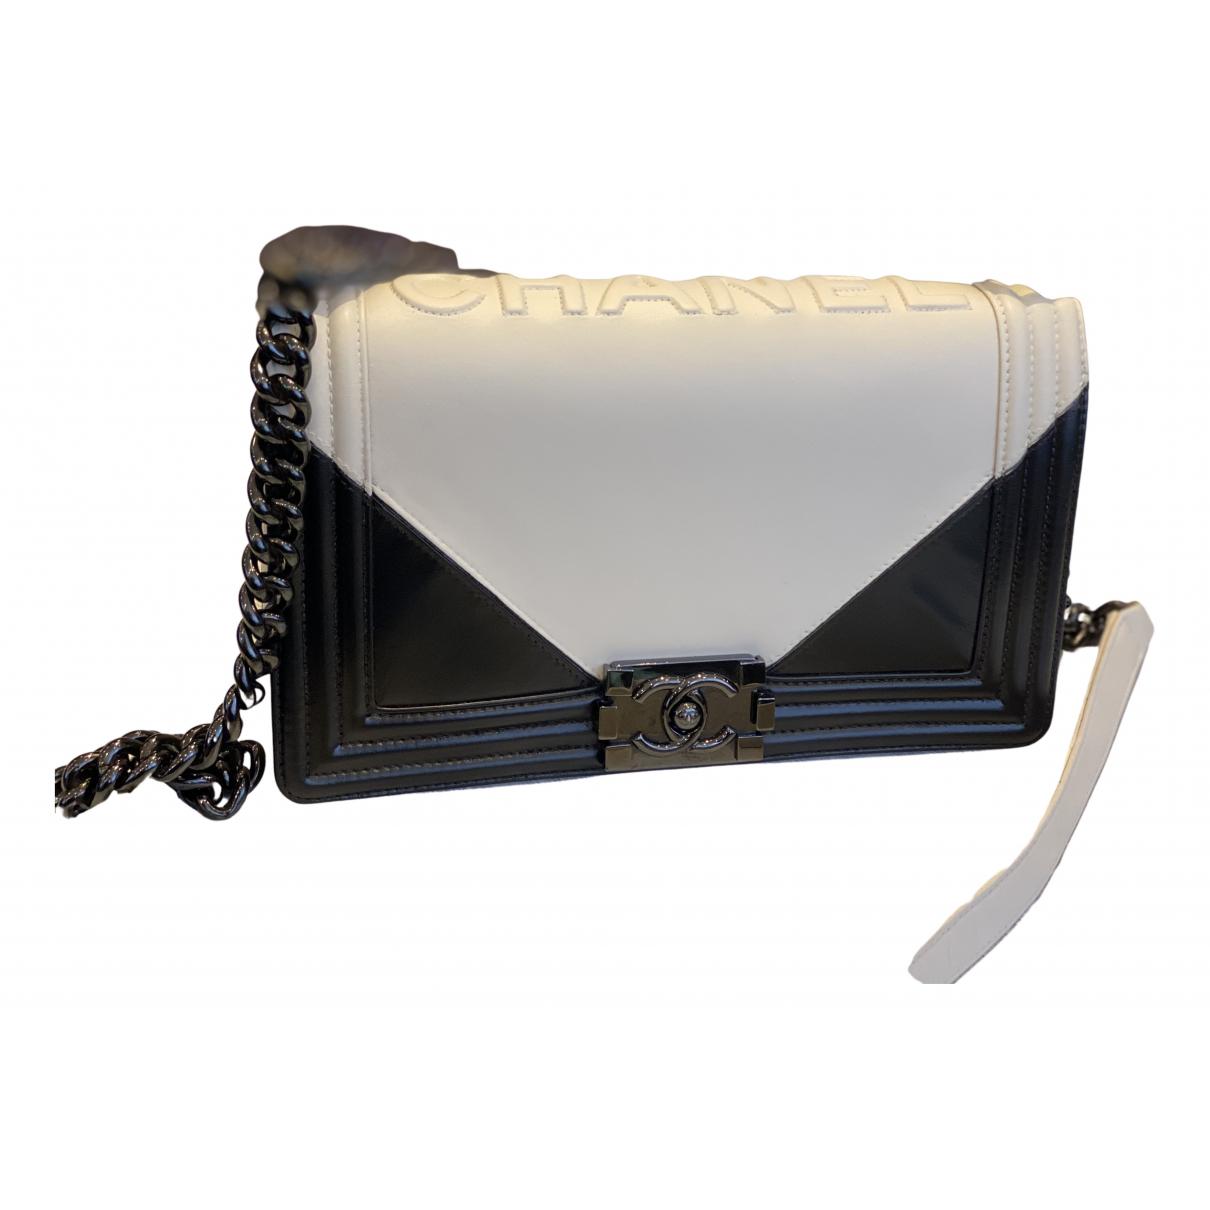 Chanel - Sac a main Boy pour femme en cuir - blanc